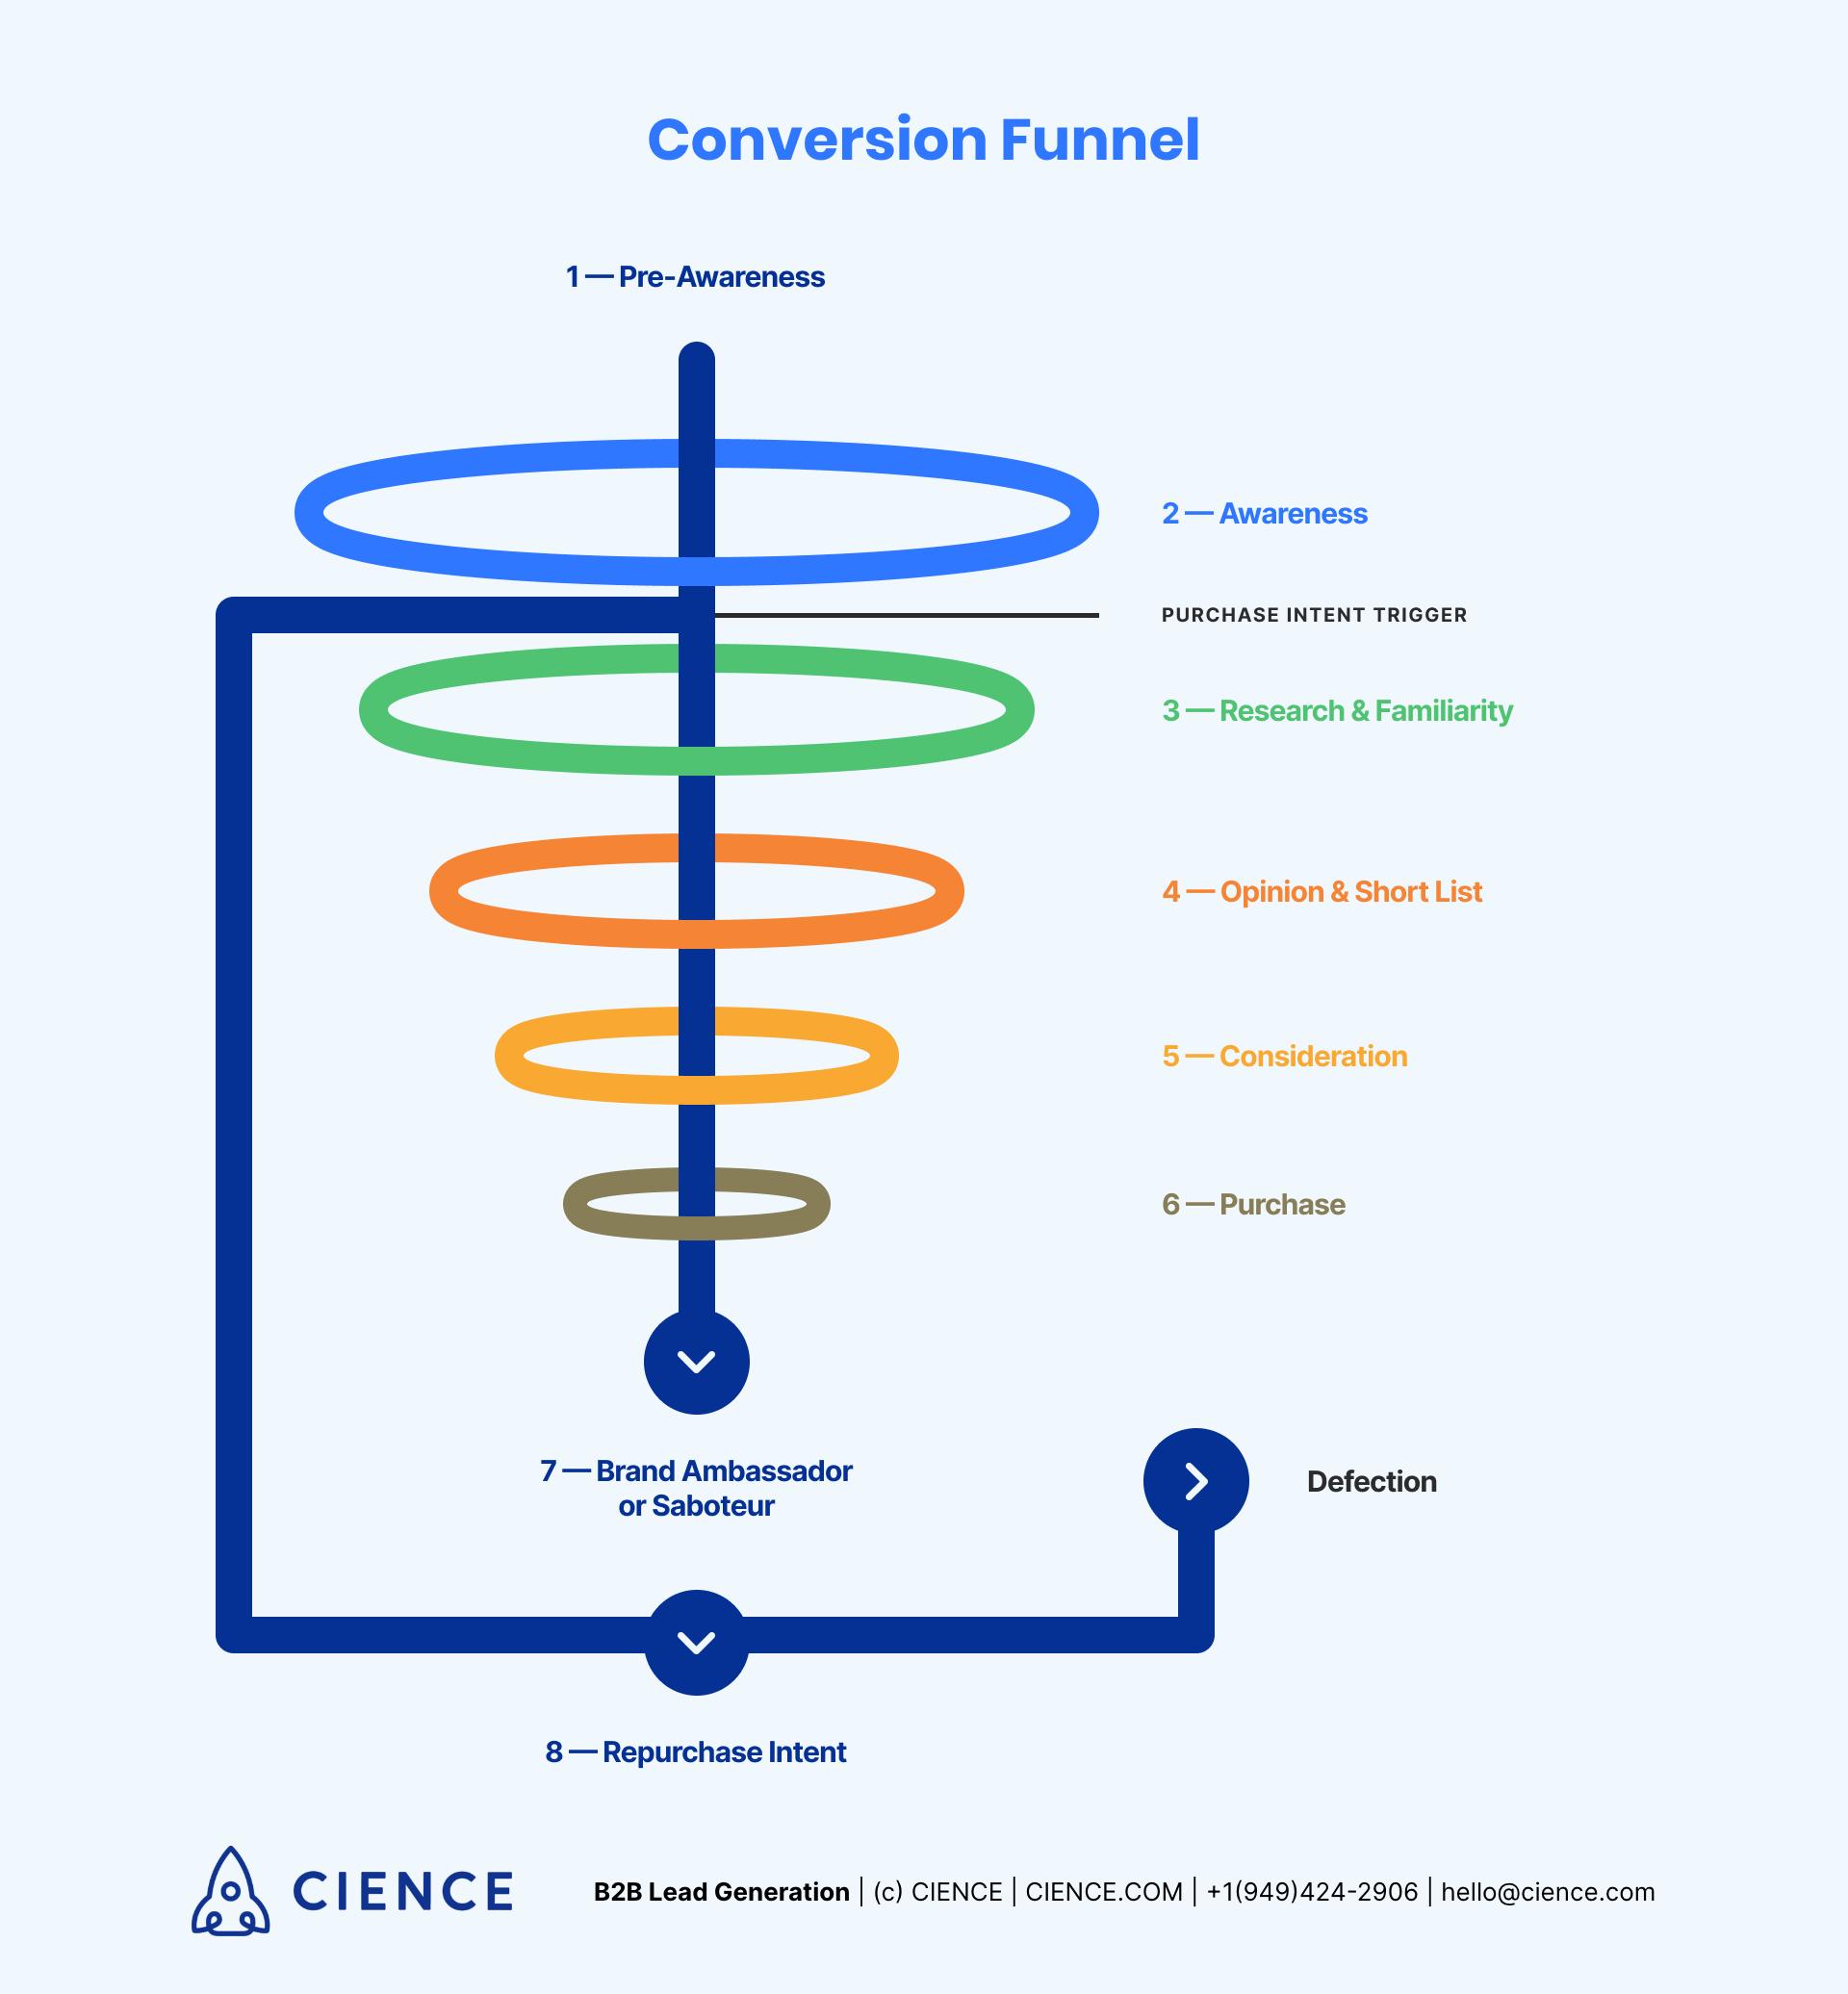 Conversation Funnel